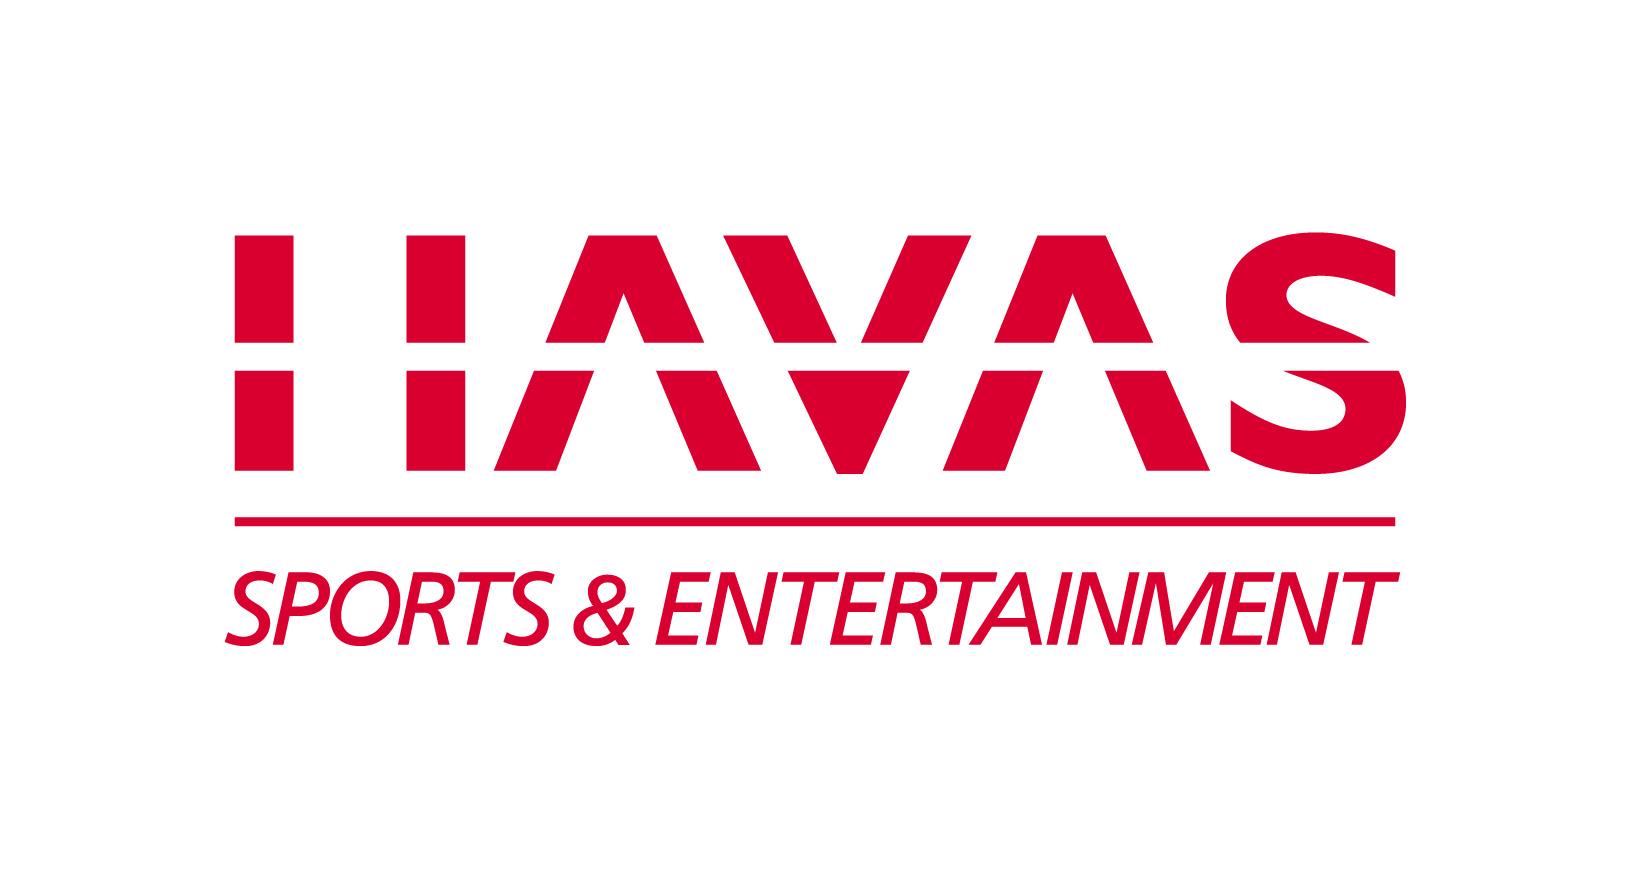 Londres 2012 : BMW, Coca-Cola, EDF, Eurostar et Powerade avec Havas Sports & Entertainment